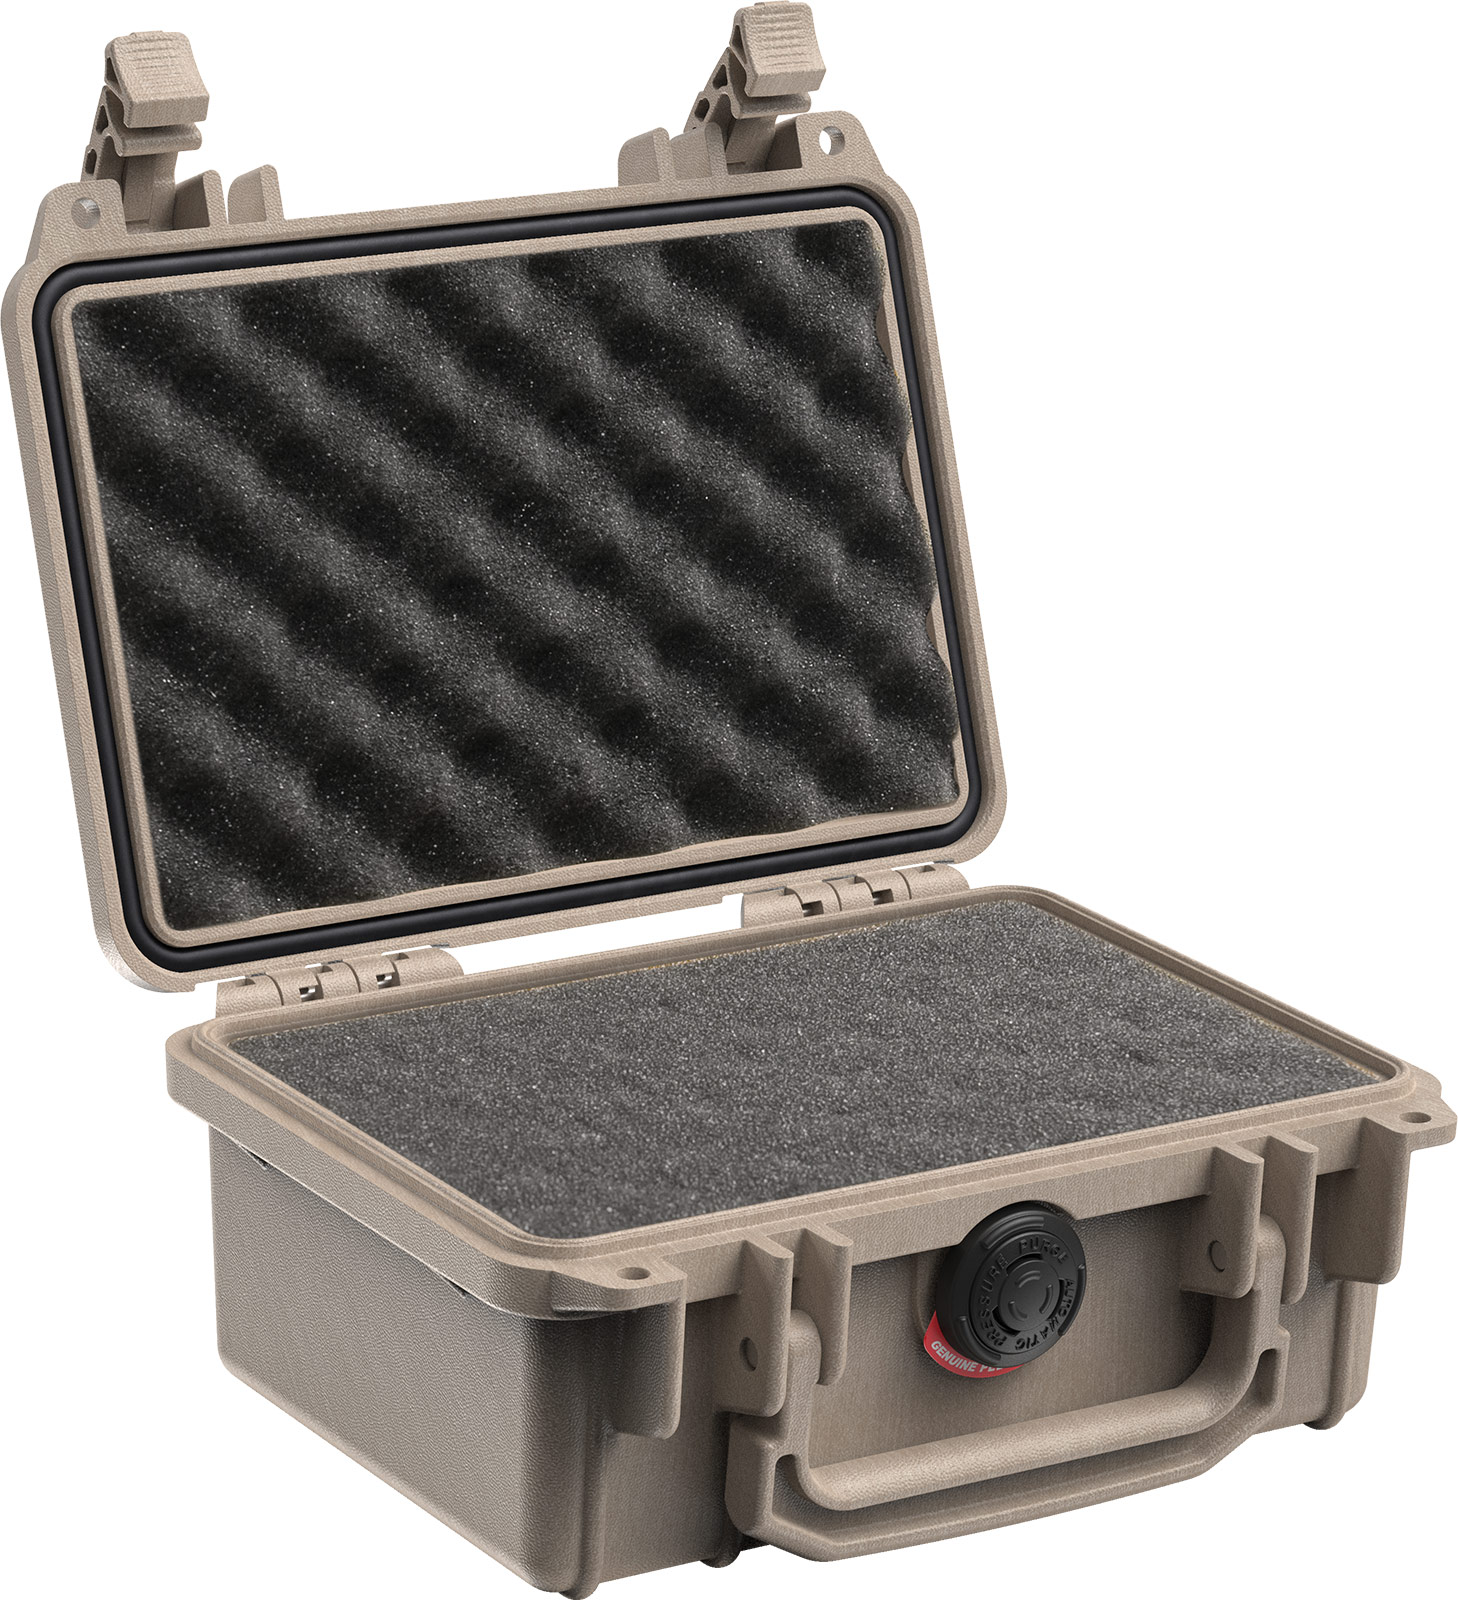 pelican watertight protective 1120 hard case